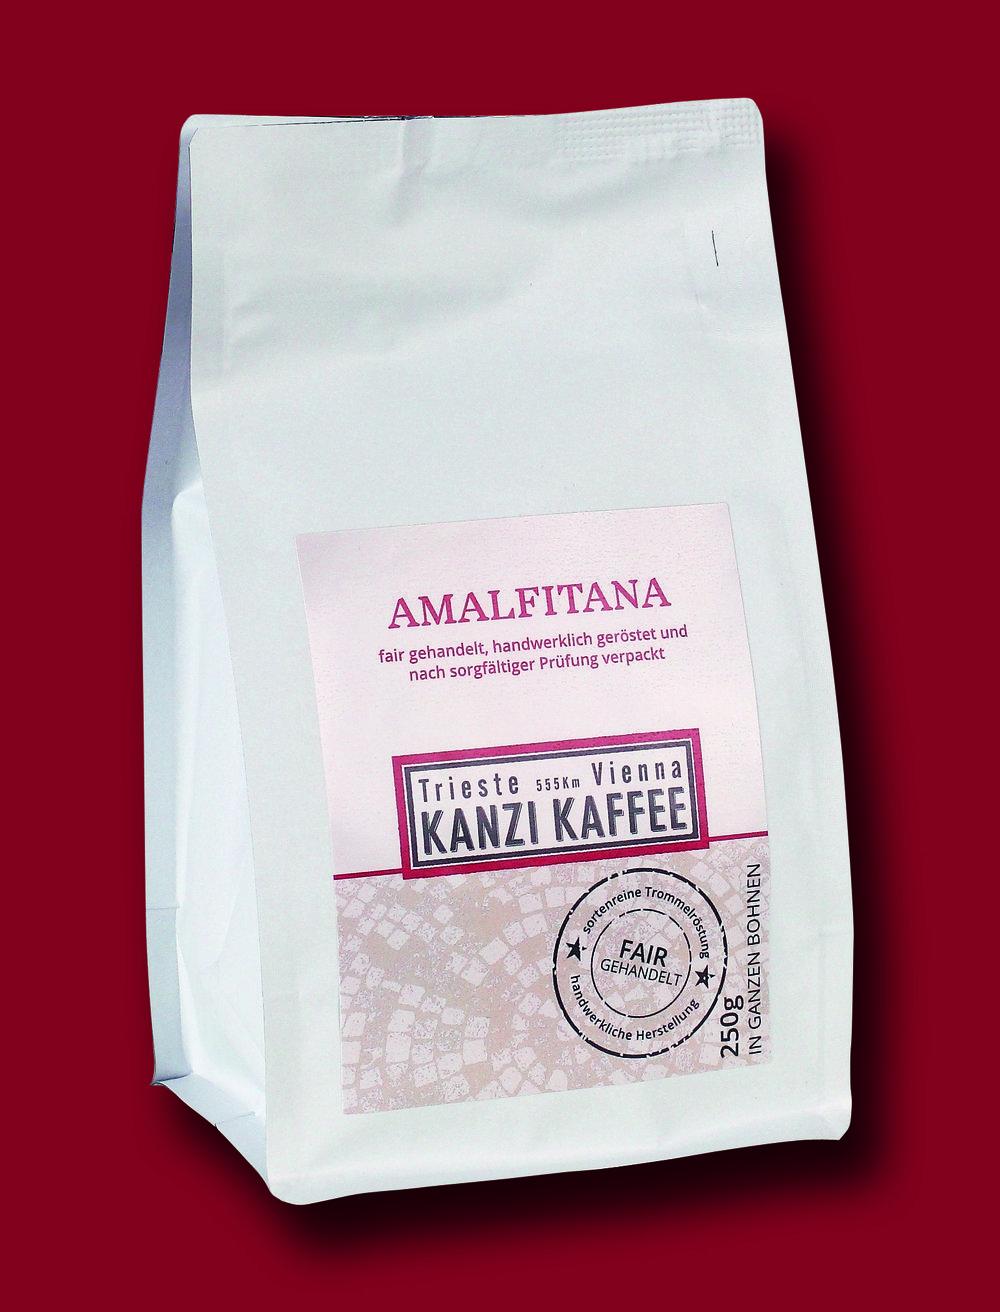 Kanzi Kaffee Amalfitana Schönbergers